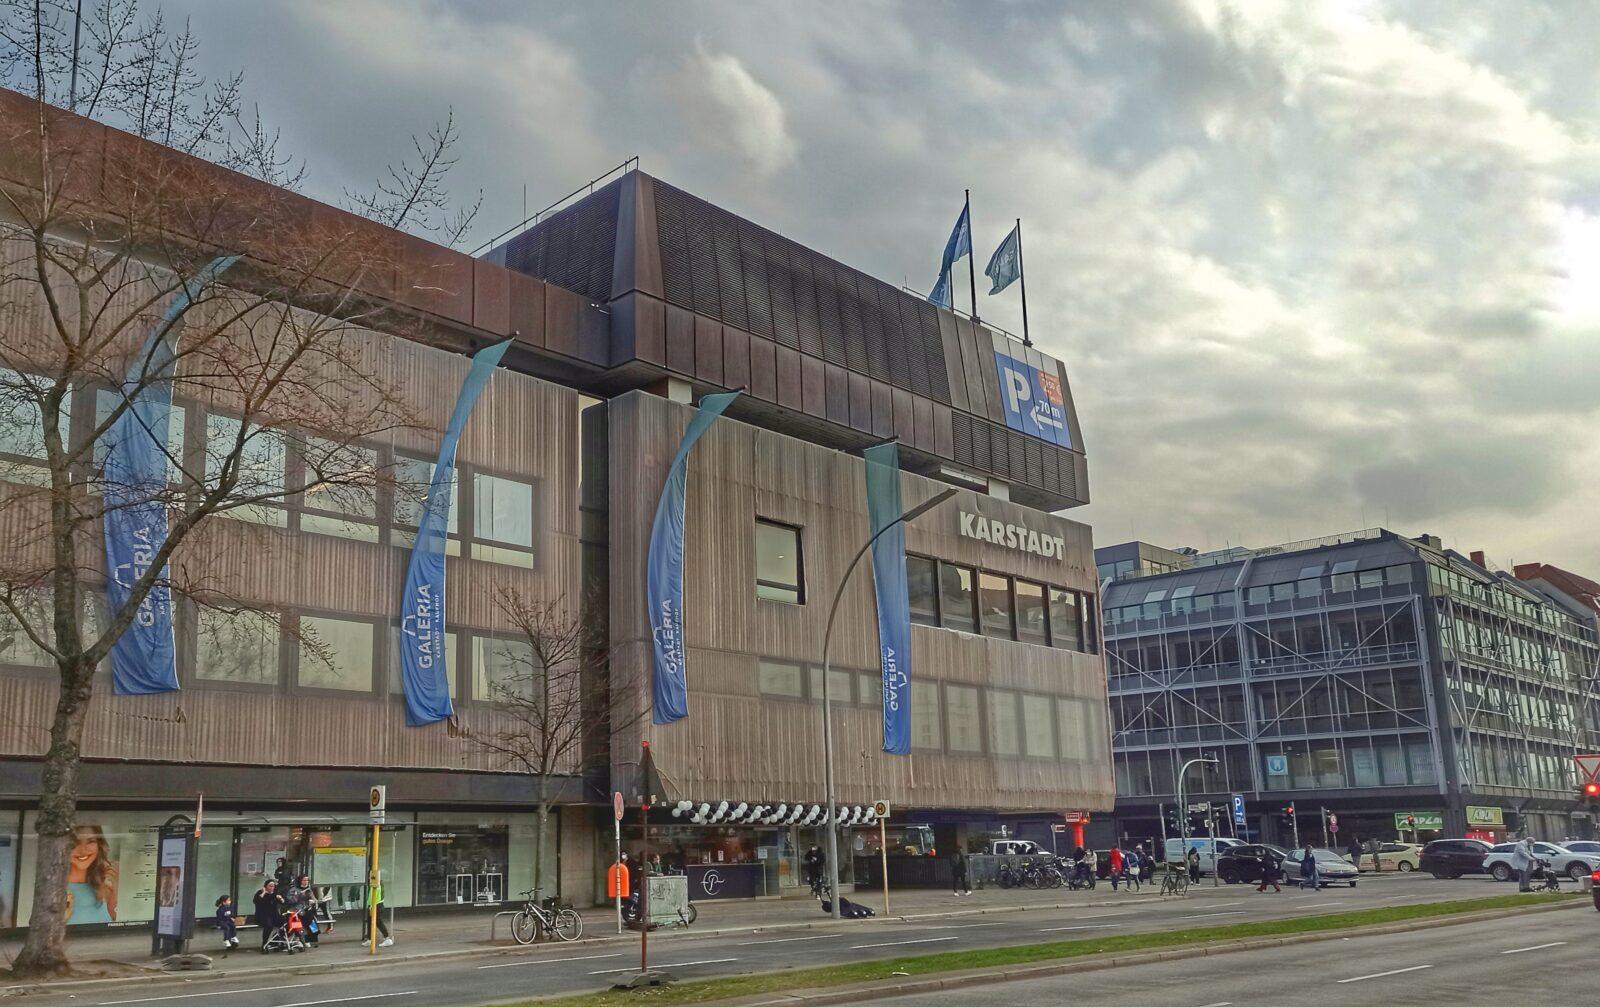 Karstadt Warenhaus